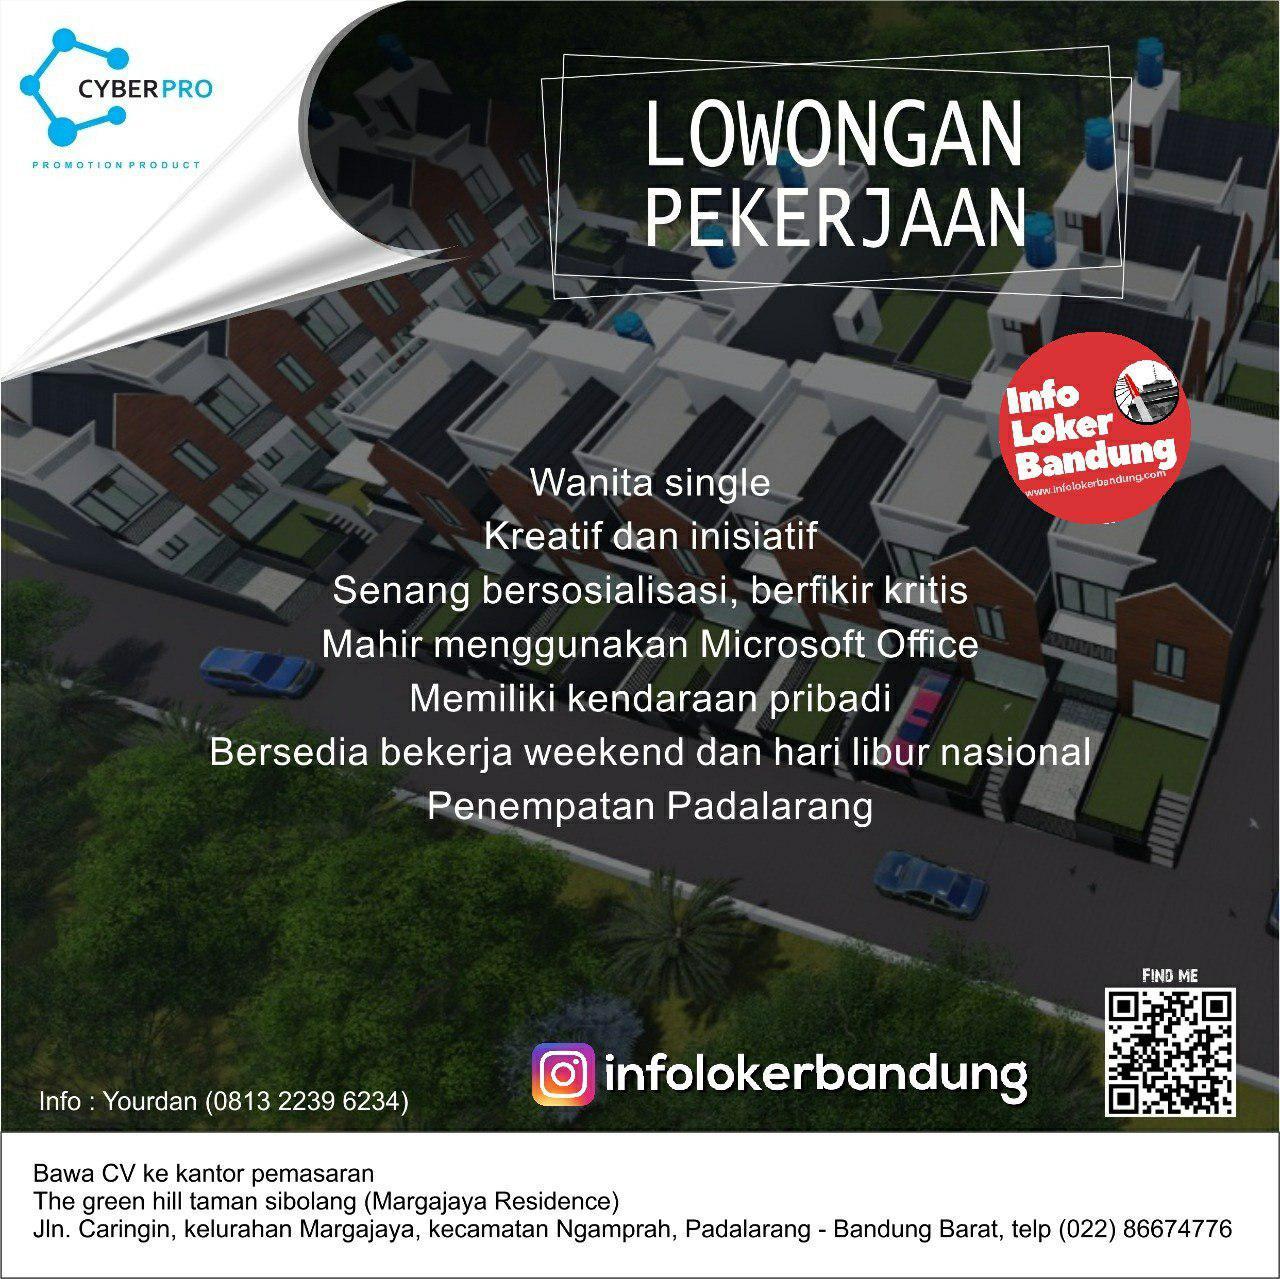 Lowongan Kerja Business Development Officer Cyber Pro Bandung Februari 2019